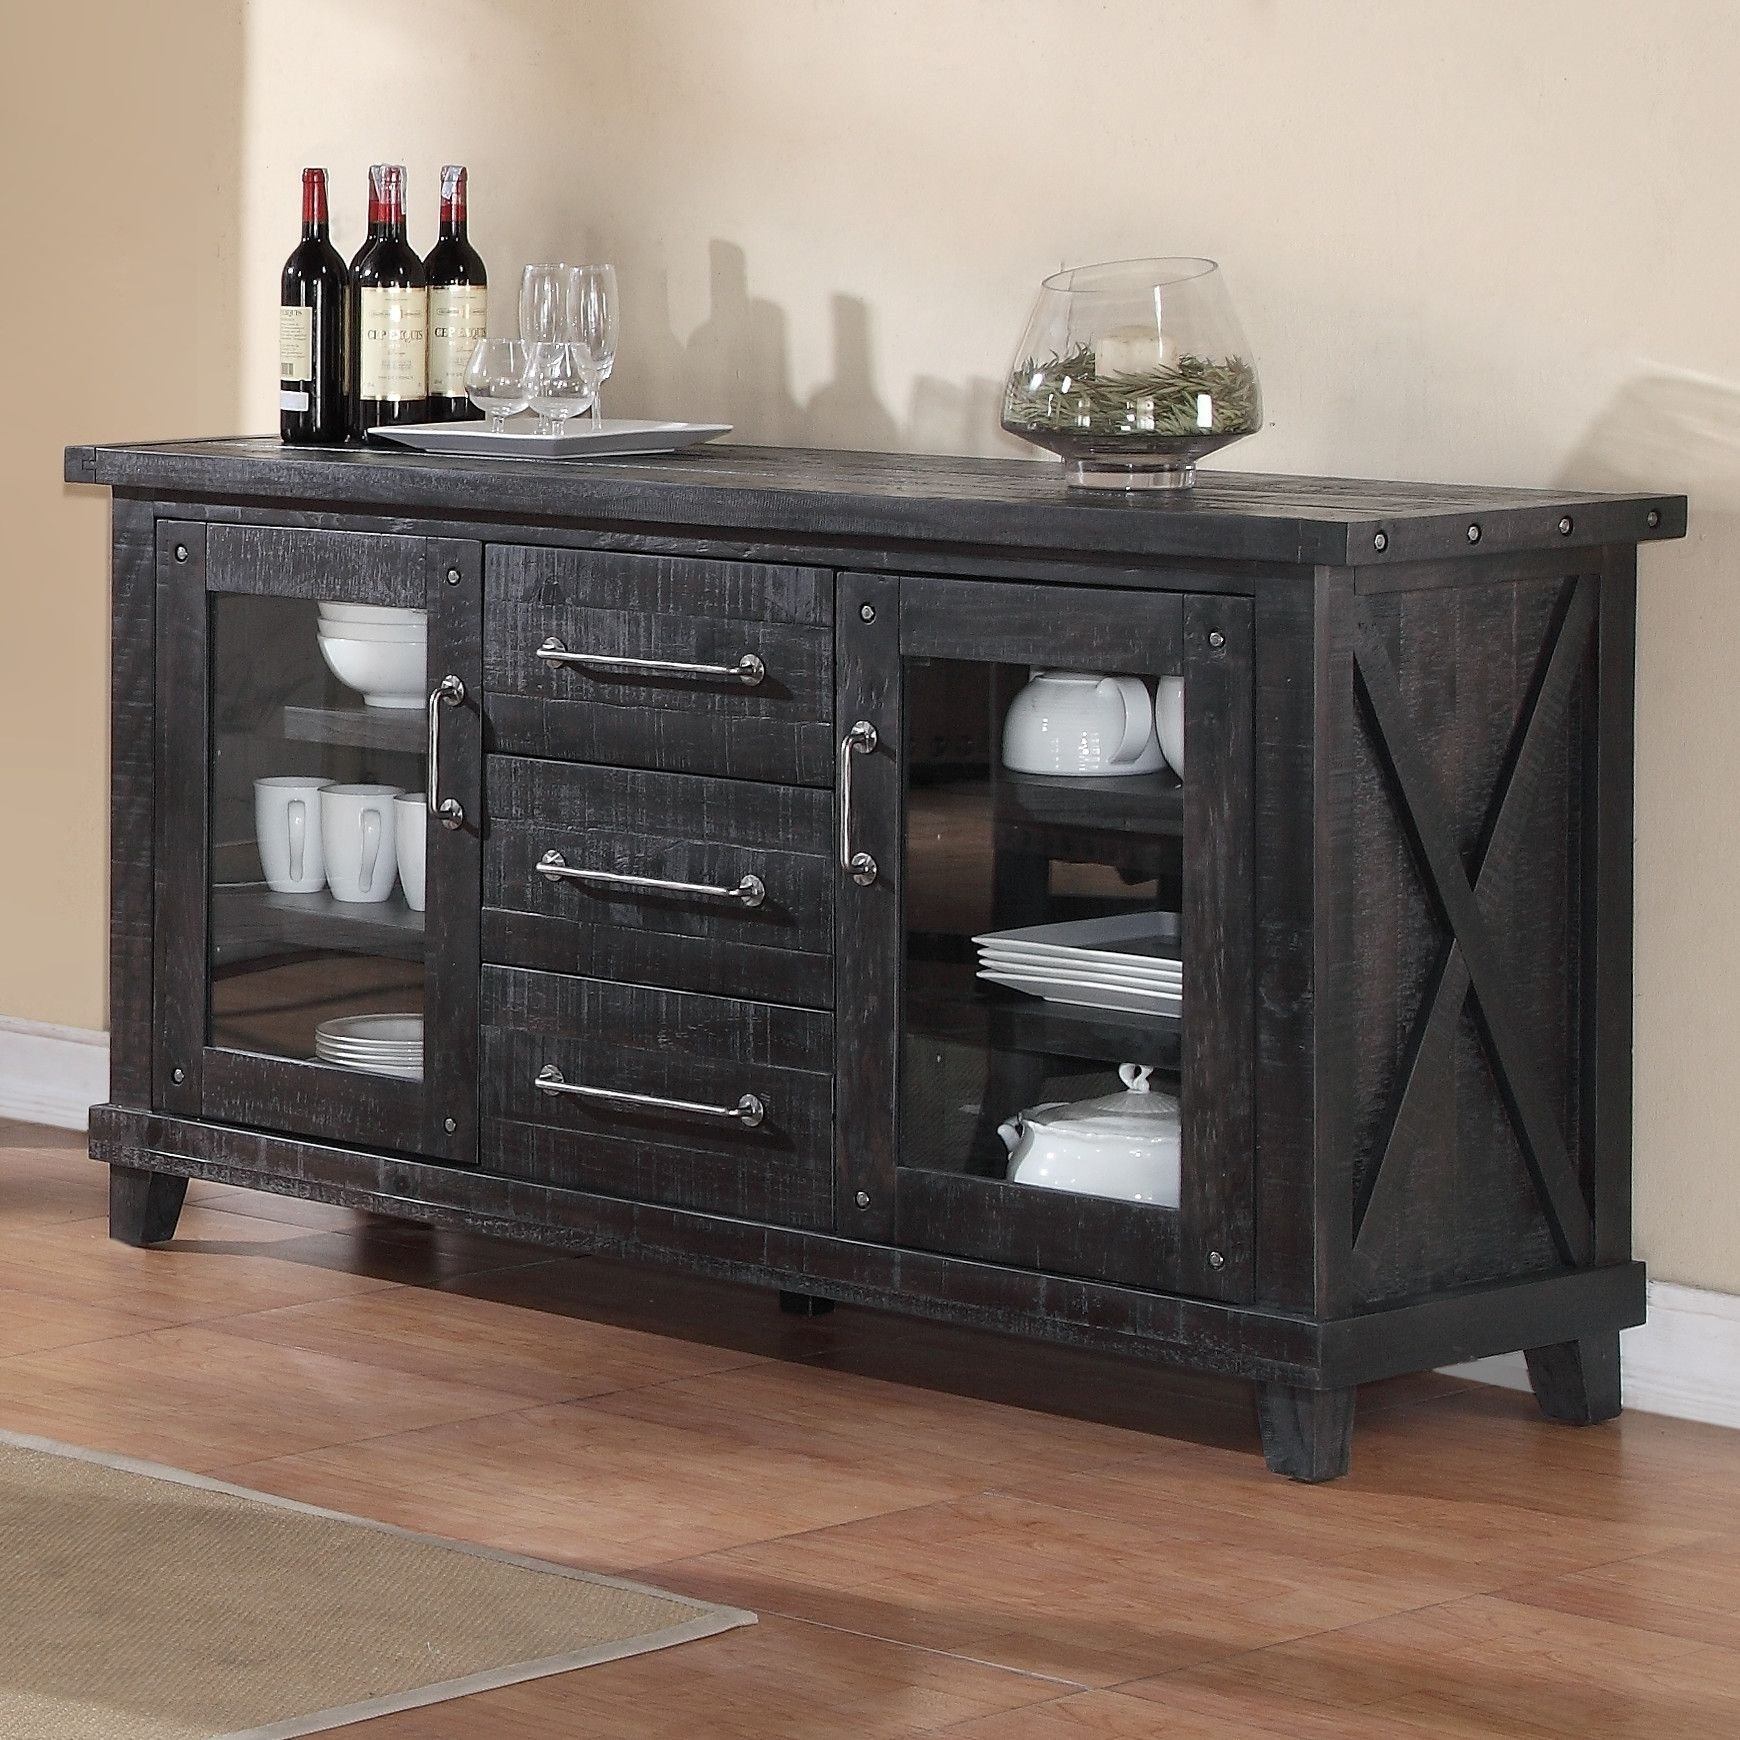 Modus Furniture Yosemite Sideboard | Decor | Pinterest | Buffet pertaining to Norwood Sideboards (Image 16 of 30)